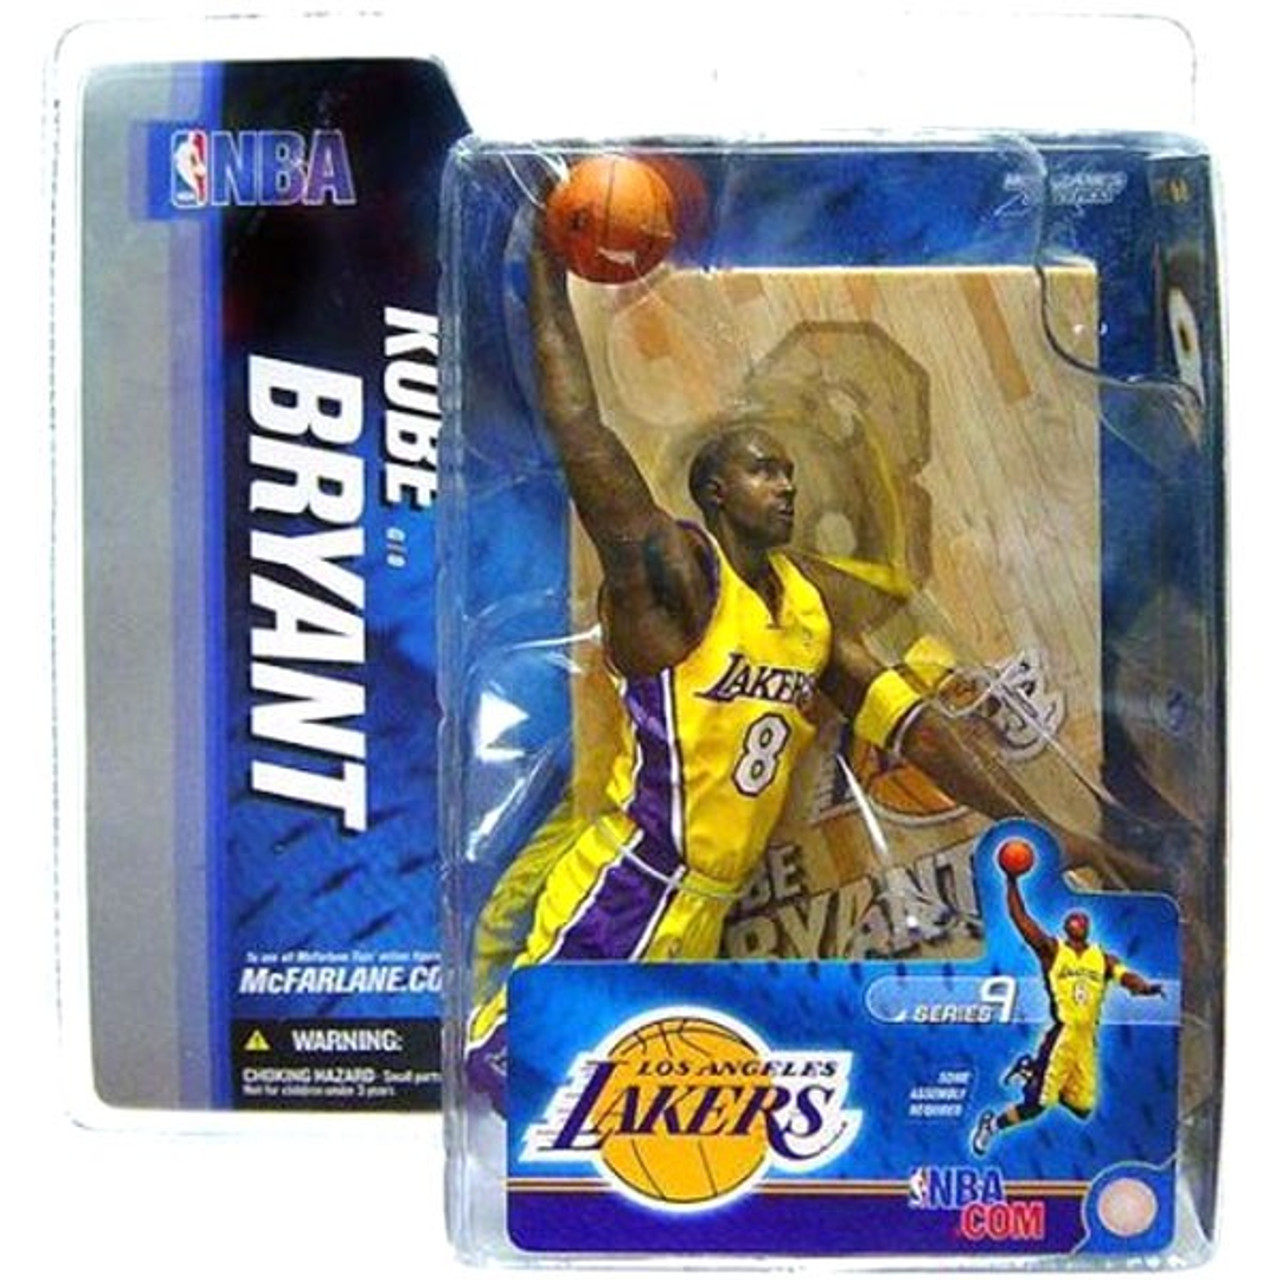 McFarlane Toys NBA Los Angeles Lakers Sports Picks Series 9 Kobe Bryant Action Figure [Purple Jersey Variant]